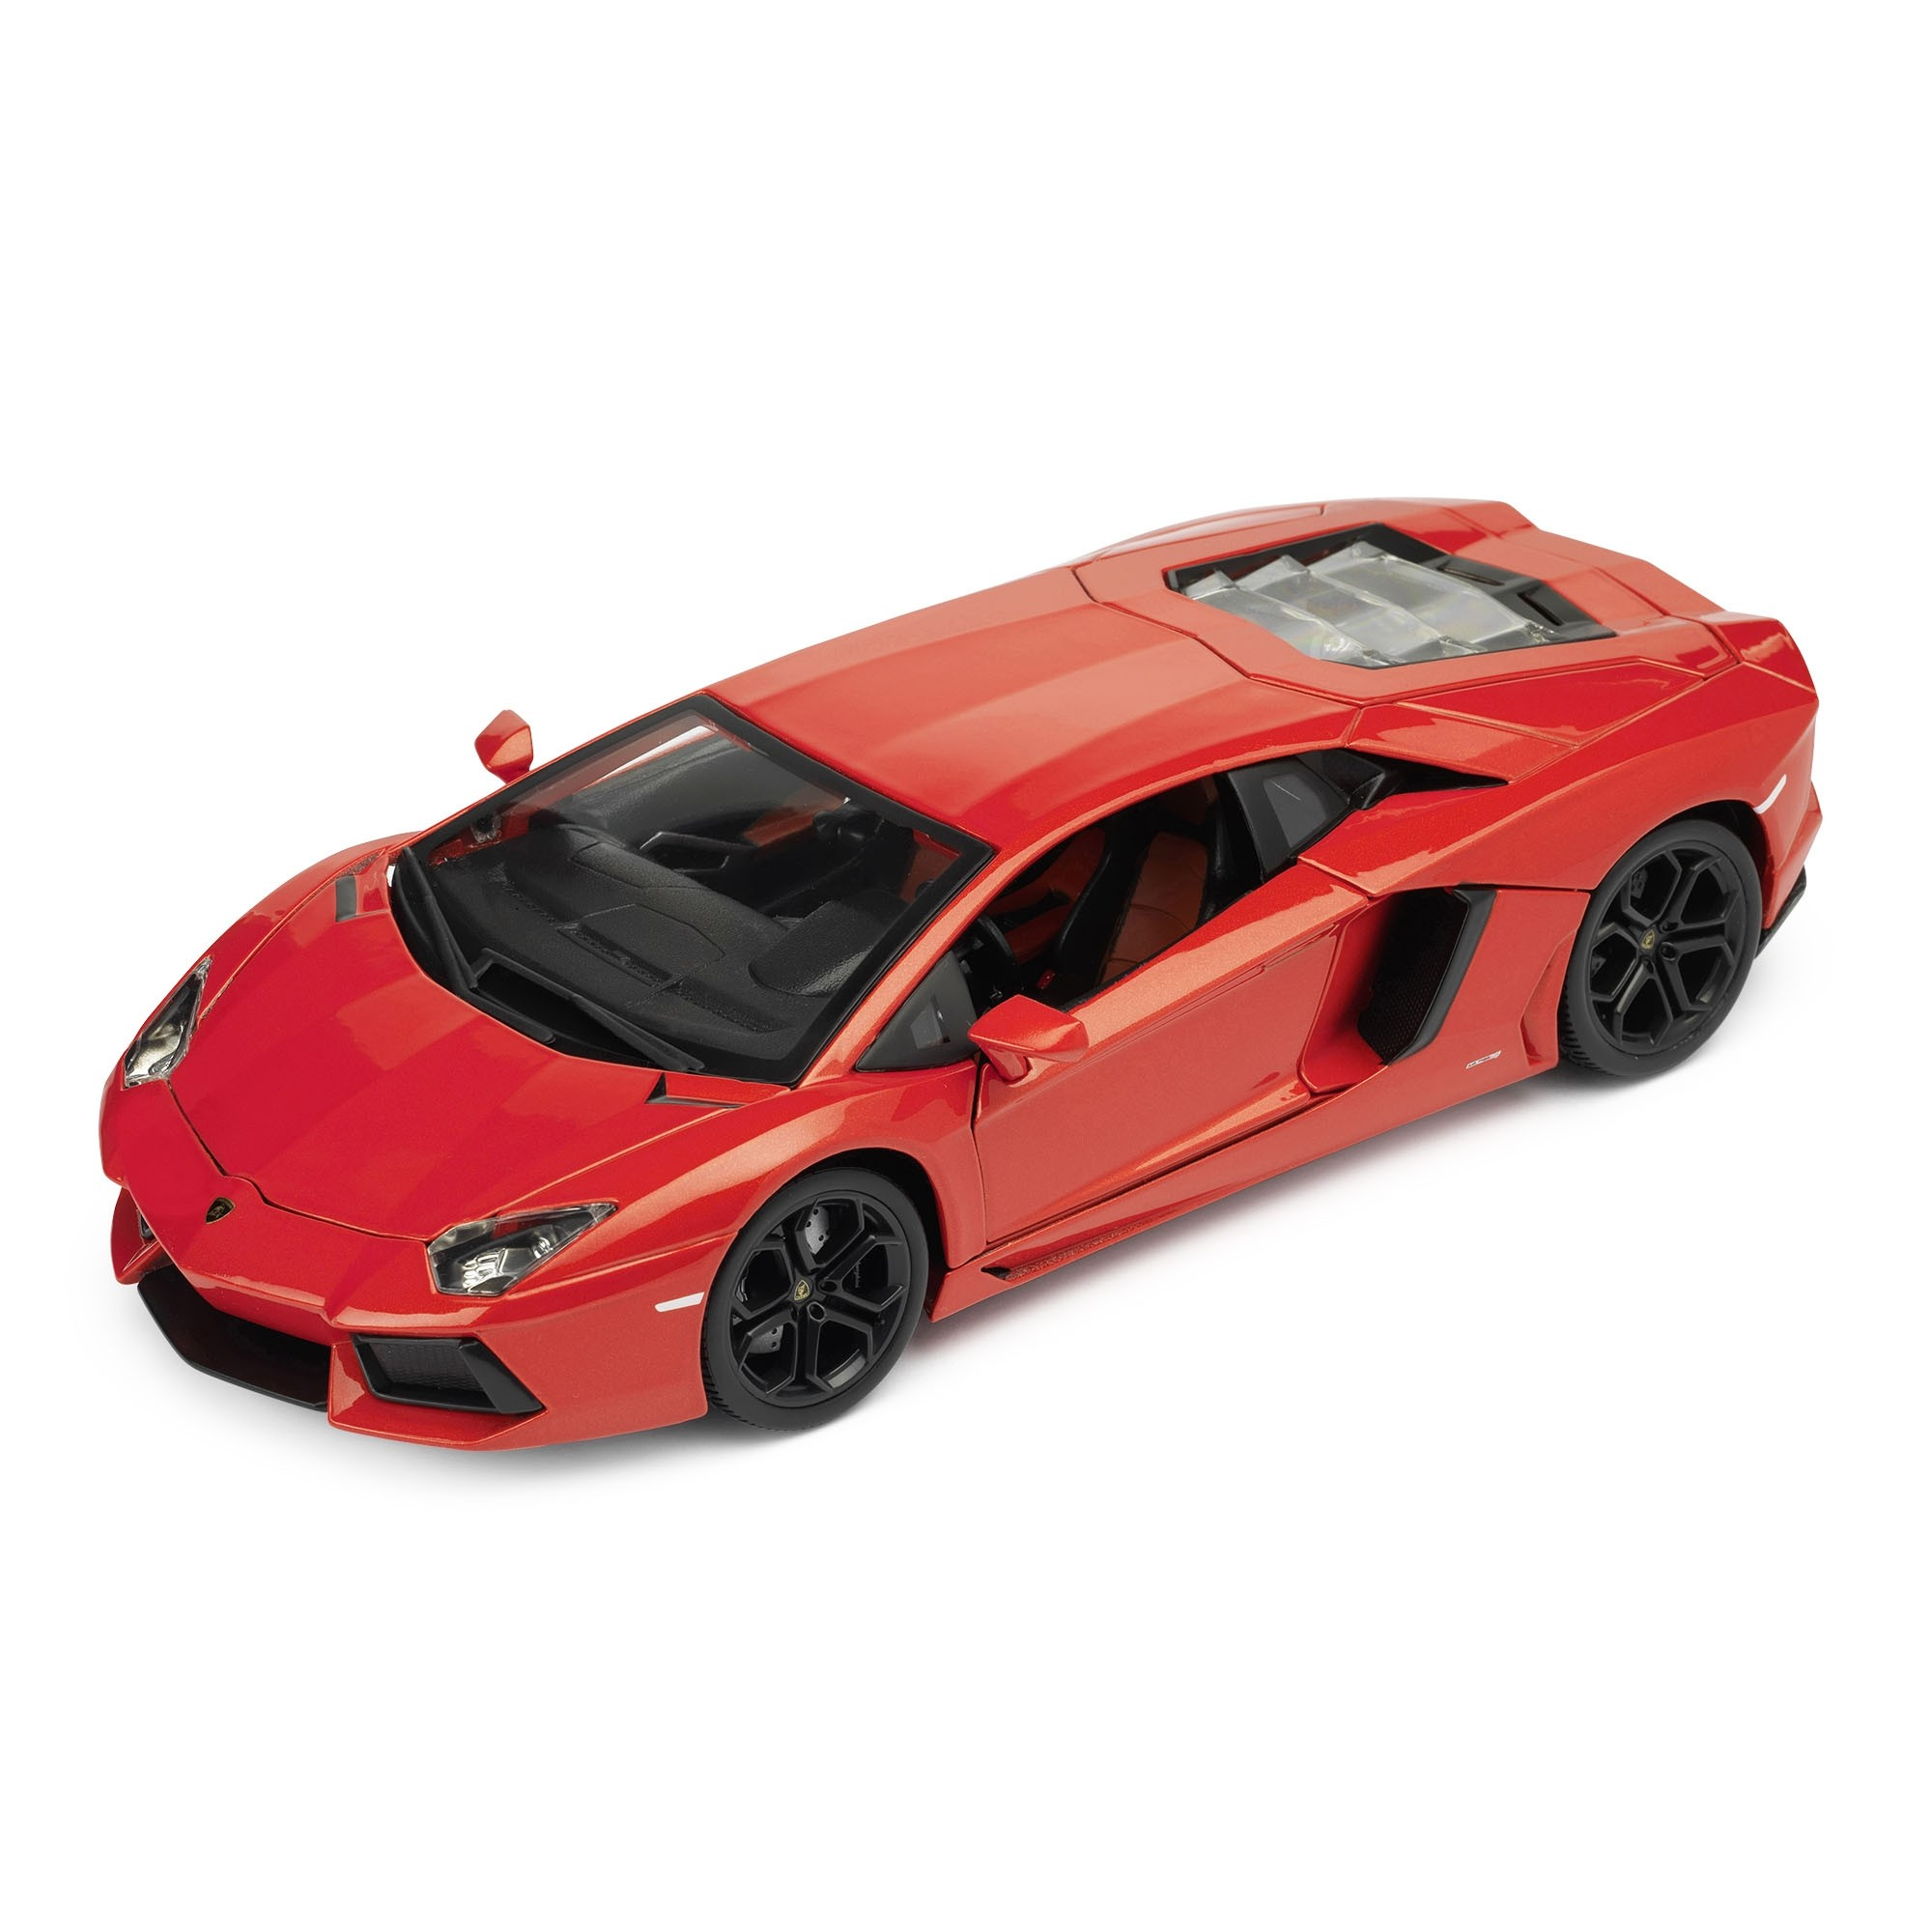 Bburago - Lamborghini Aventador